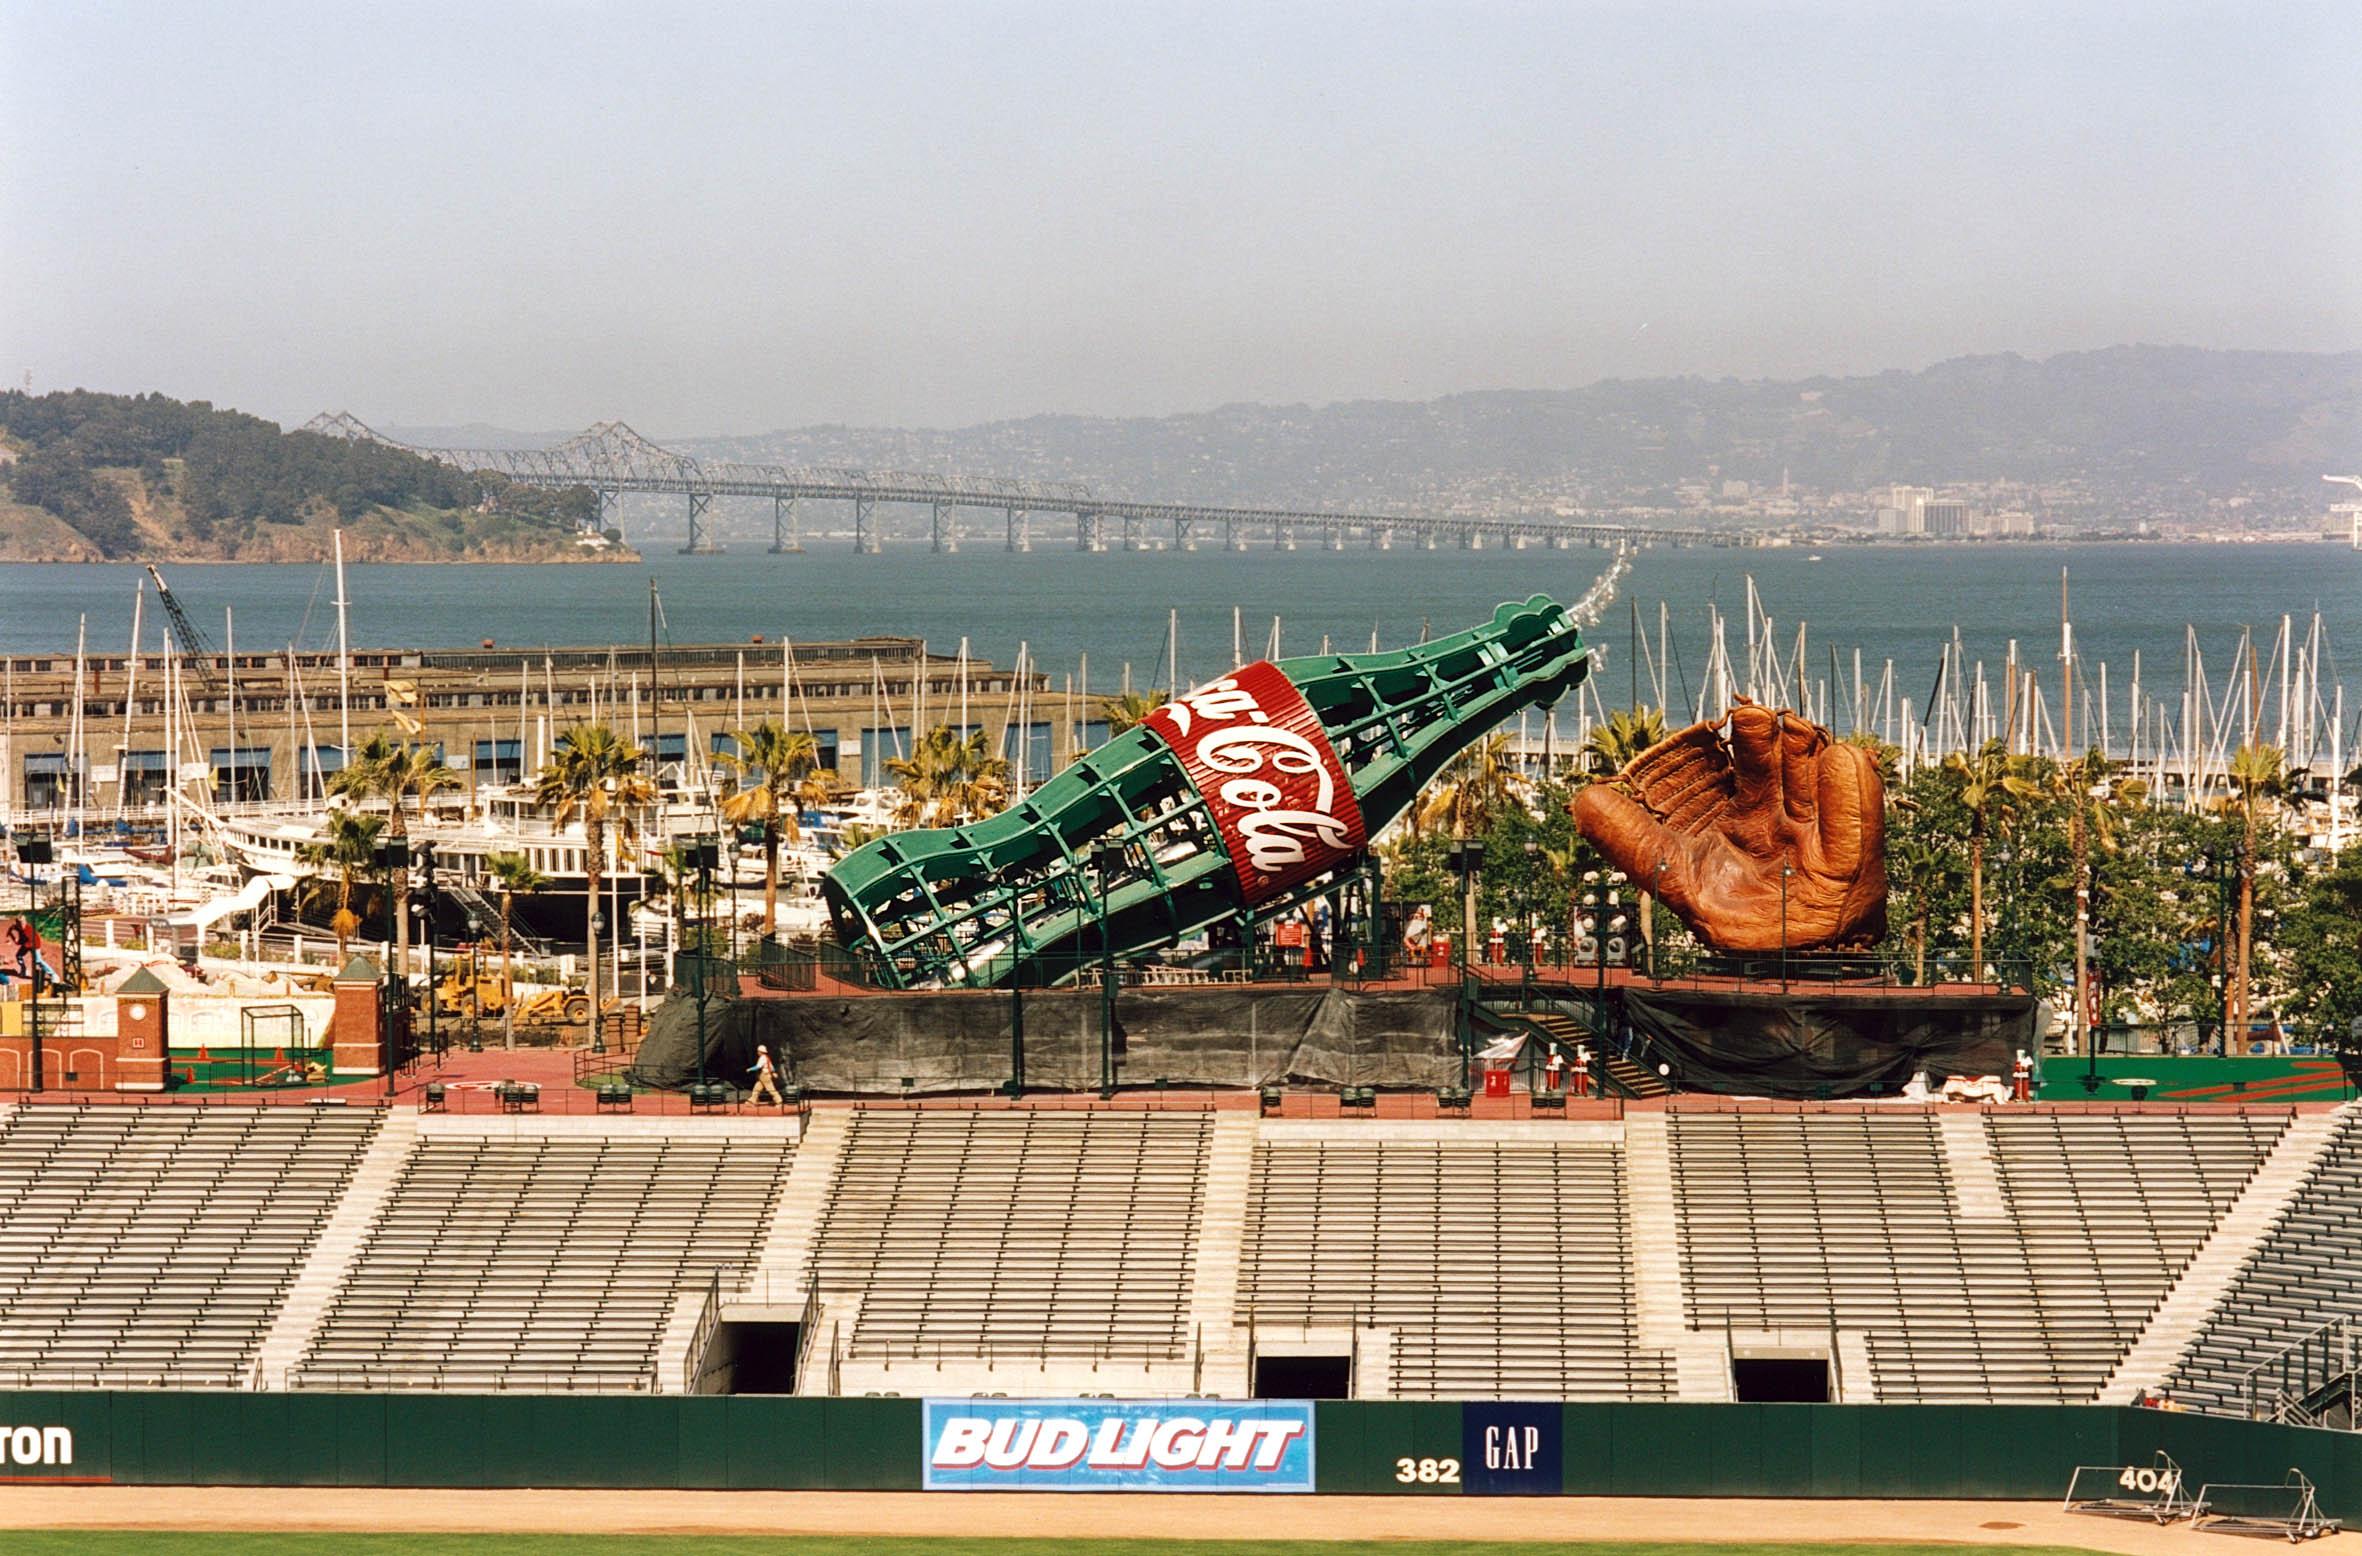 San Francisco Giants.Mitt.5.159.8.jpg